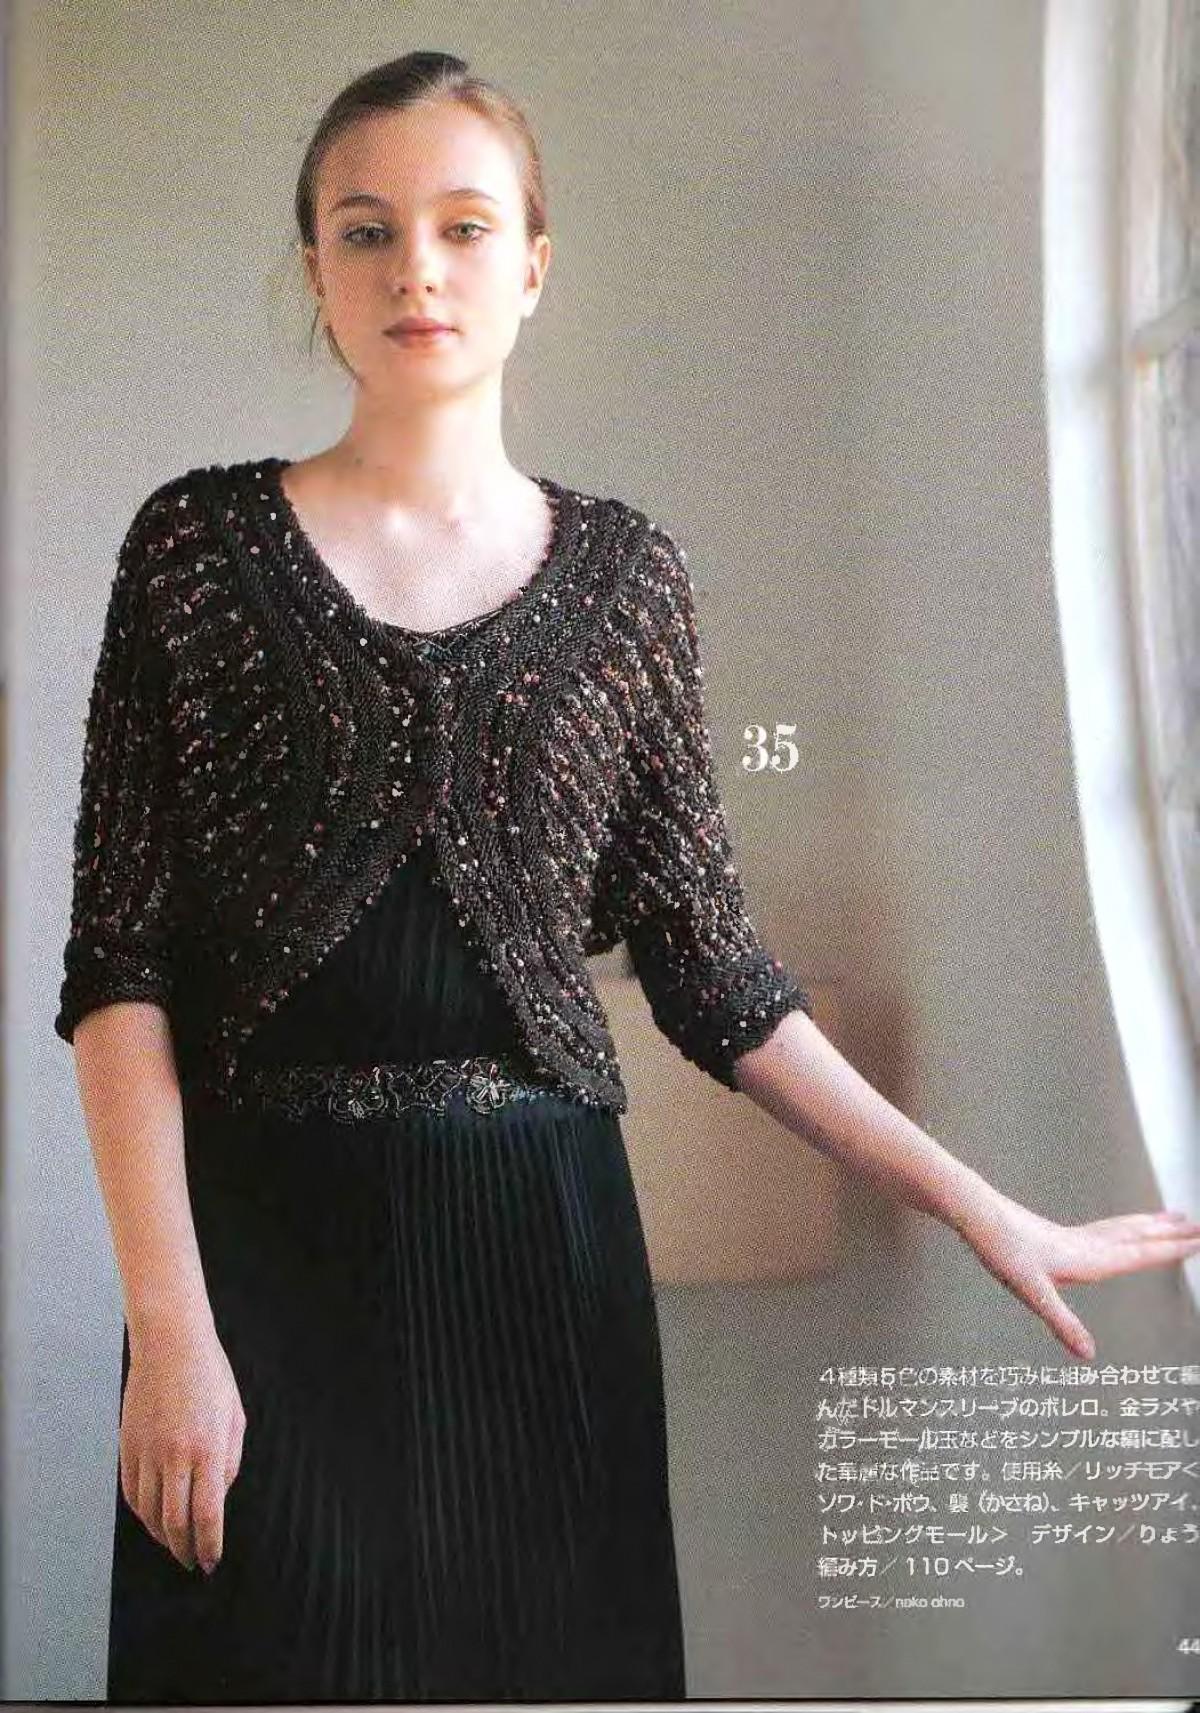 Lets-knit-series-NV4359-2008-Spring-Summer-sp-kr_42.jpg